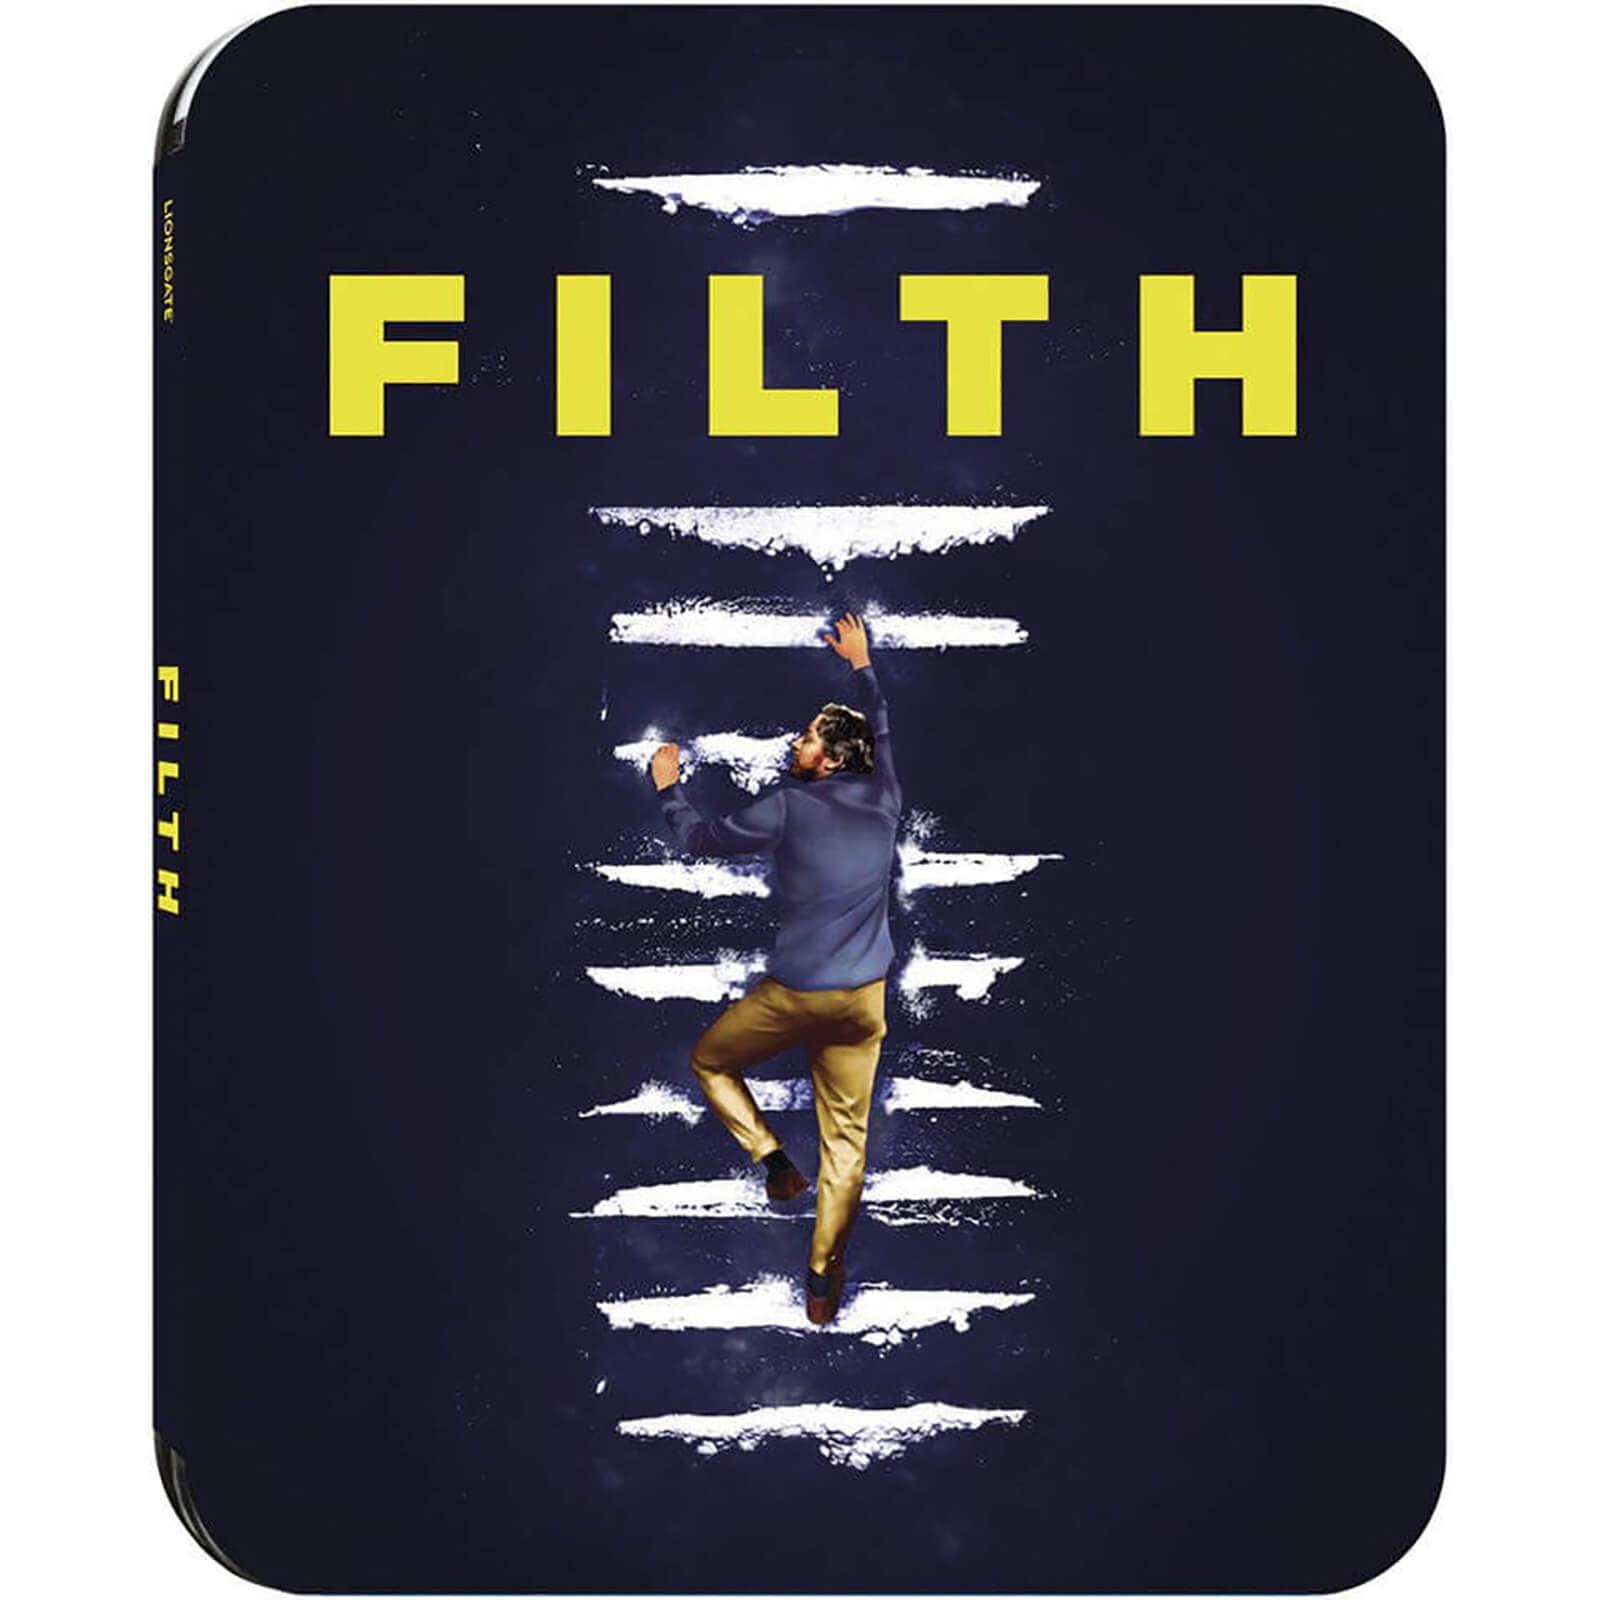 Filth - Steelbook Edition